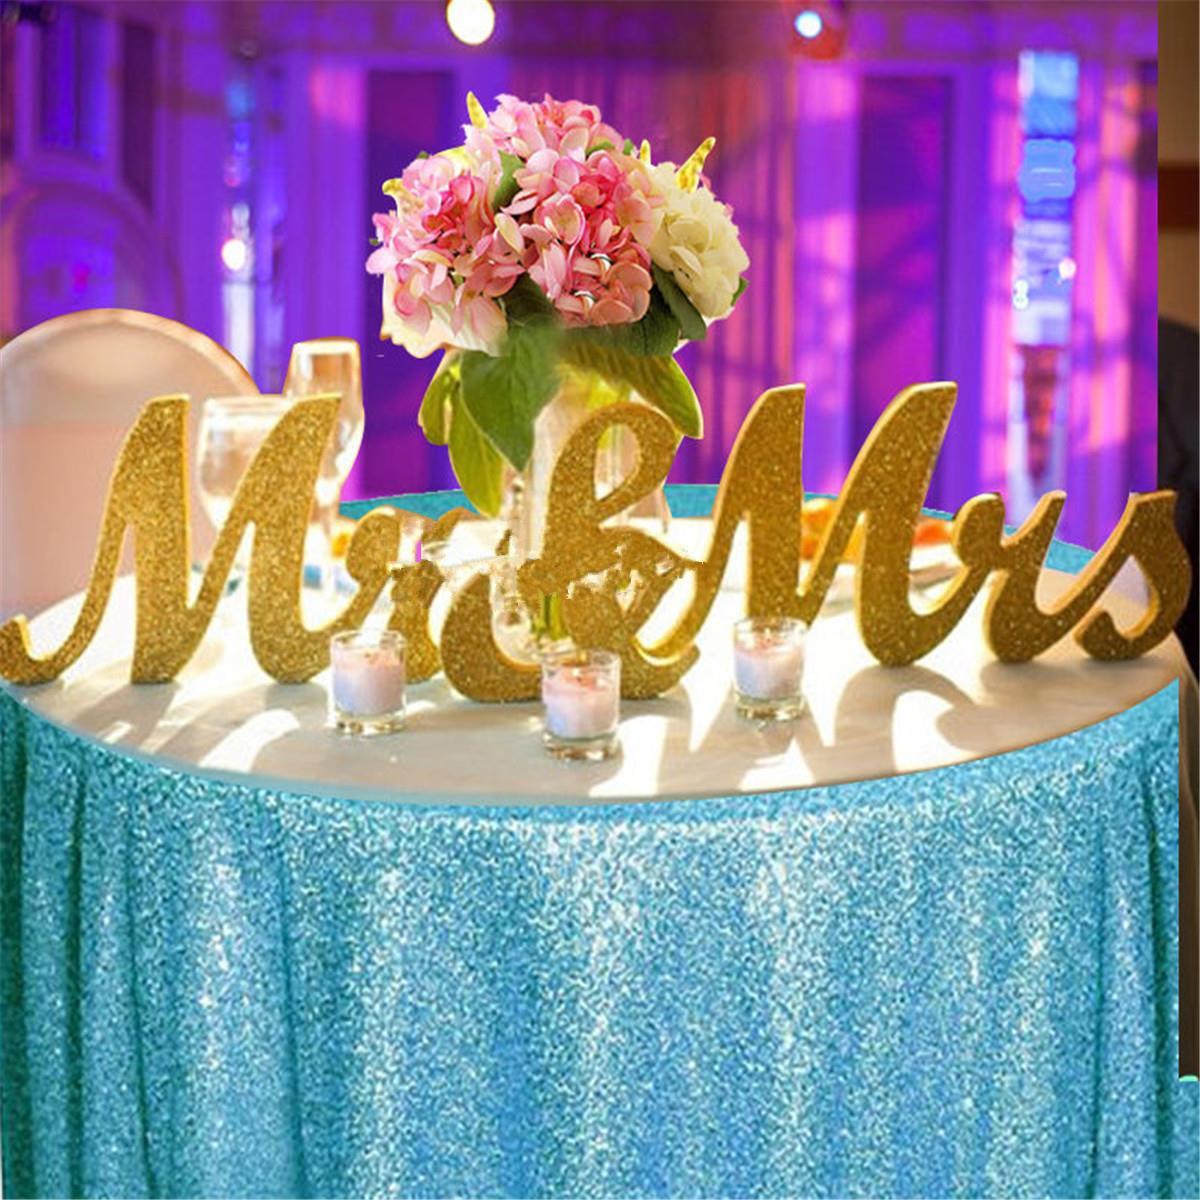 Decorated Reception Halls Wedding Online Get Cheap Reception Wedding Decorations Aliexpresscom